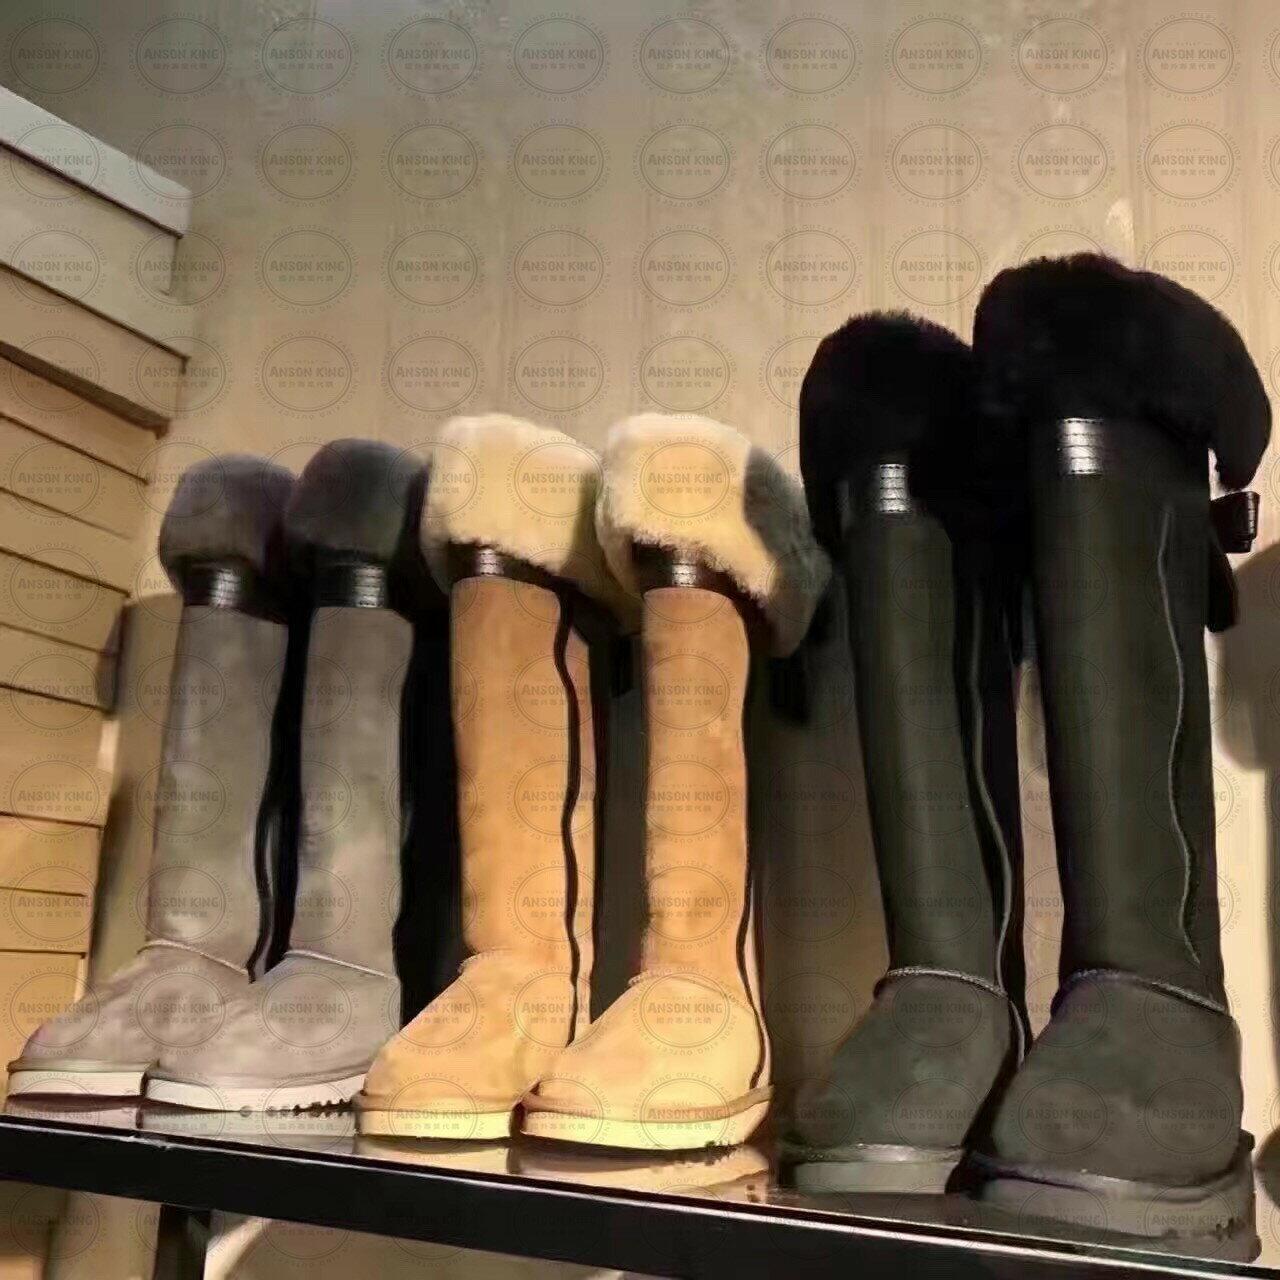 OUTLET正品代購 澳洲 UGG 千頌伊同款過膝羊皮毛雪靴 保暖 真皮羊皮毛 雪靴 短靴 黑色 2